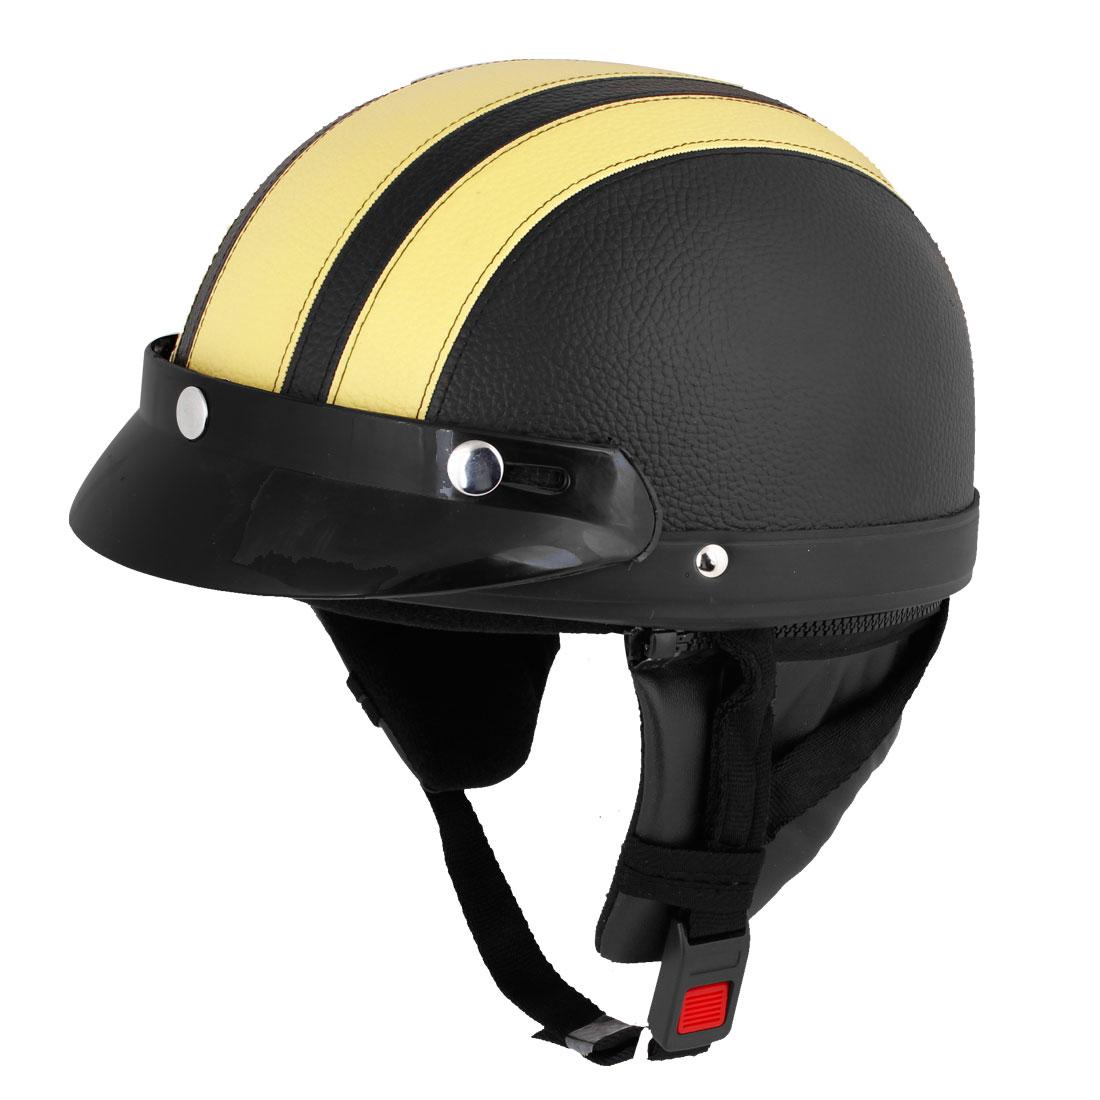 Yellow Black Faux Leather Covered Motorcycle Skull Cap Half Helmet w Scoop Visor